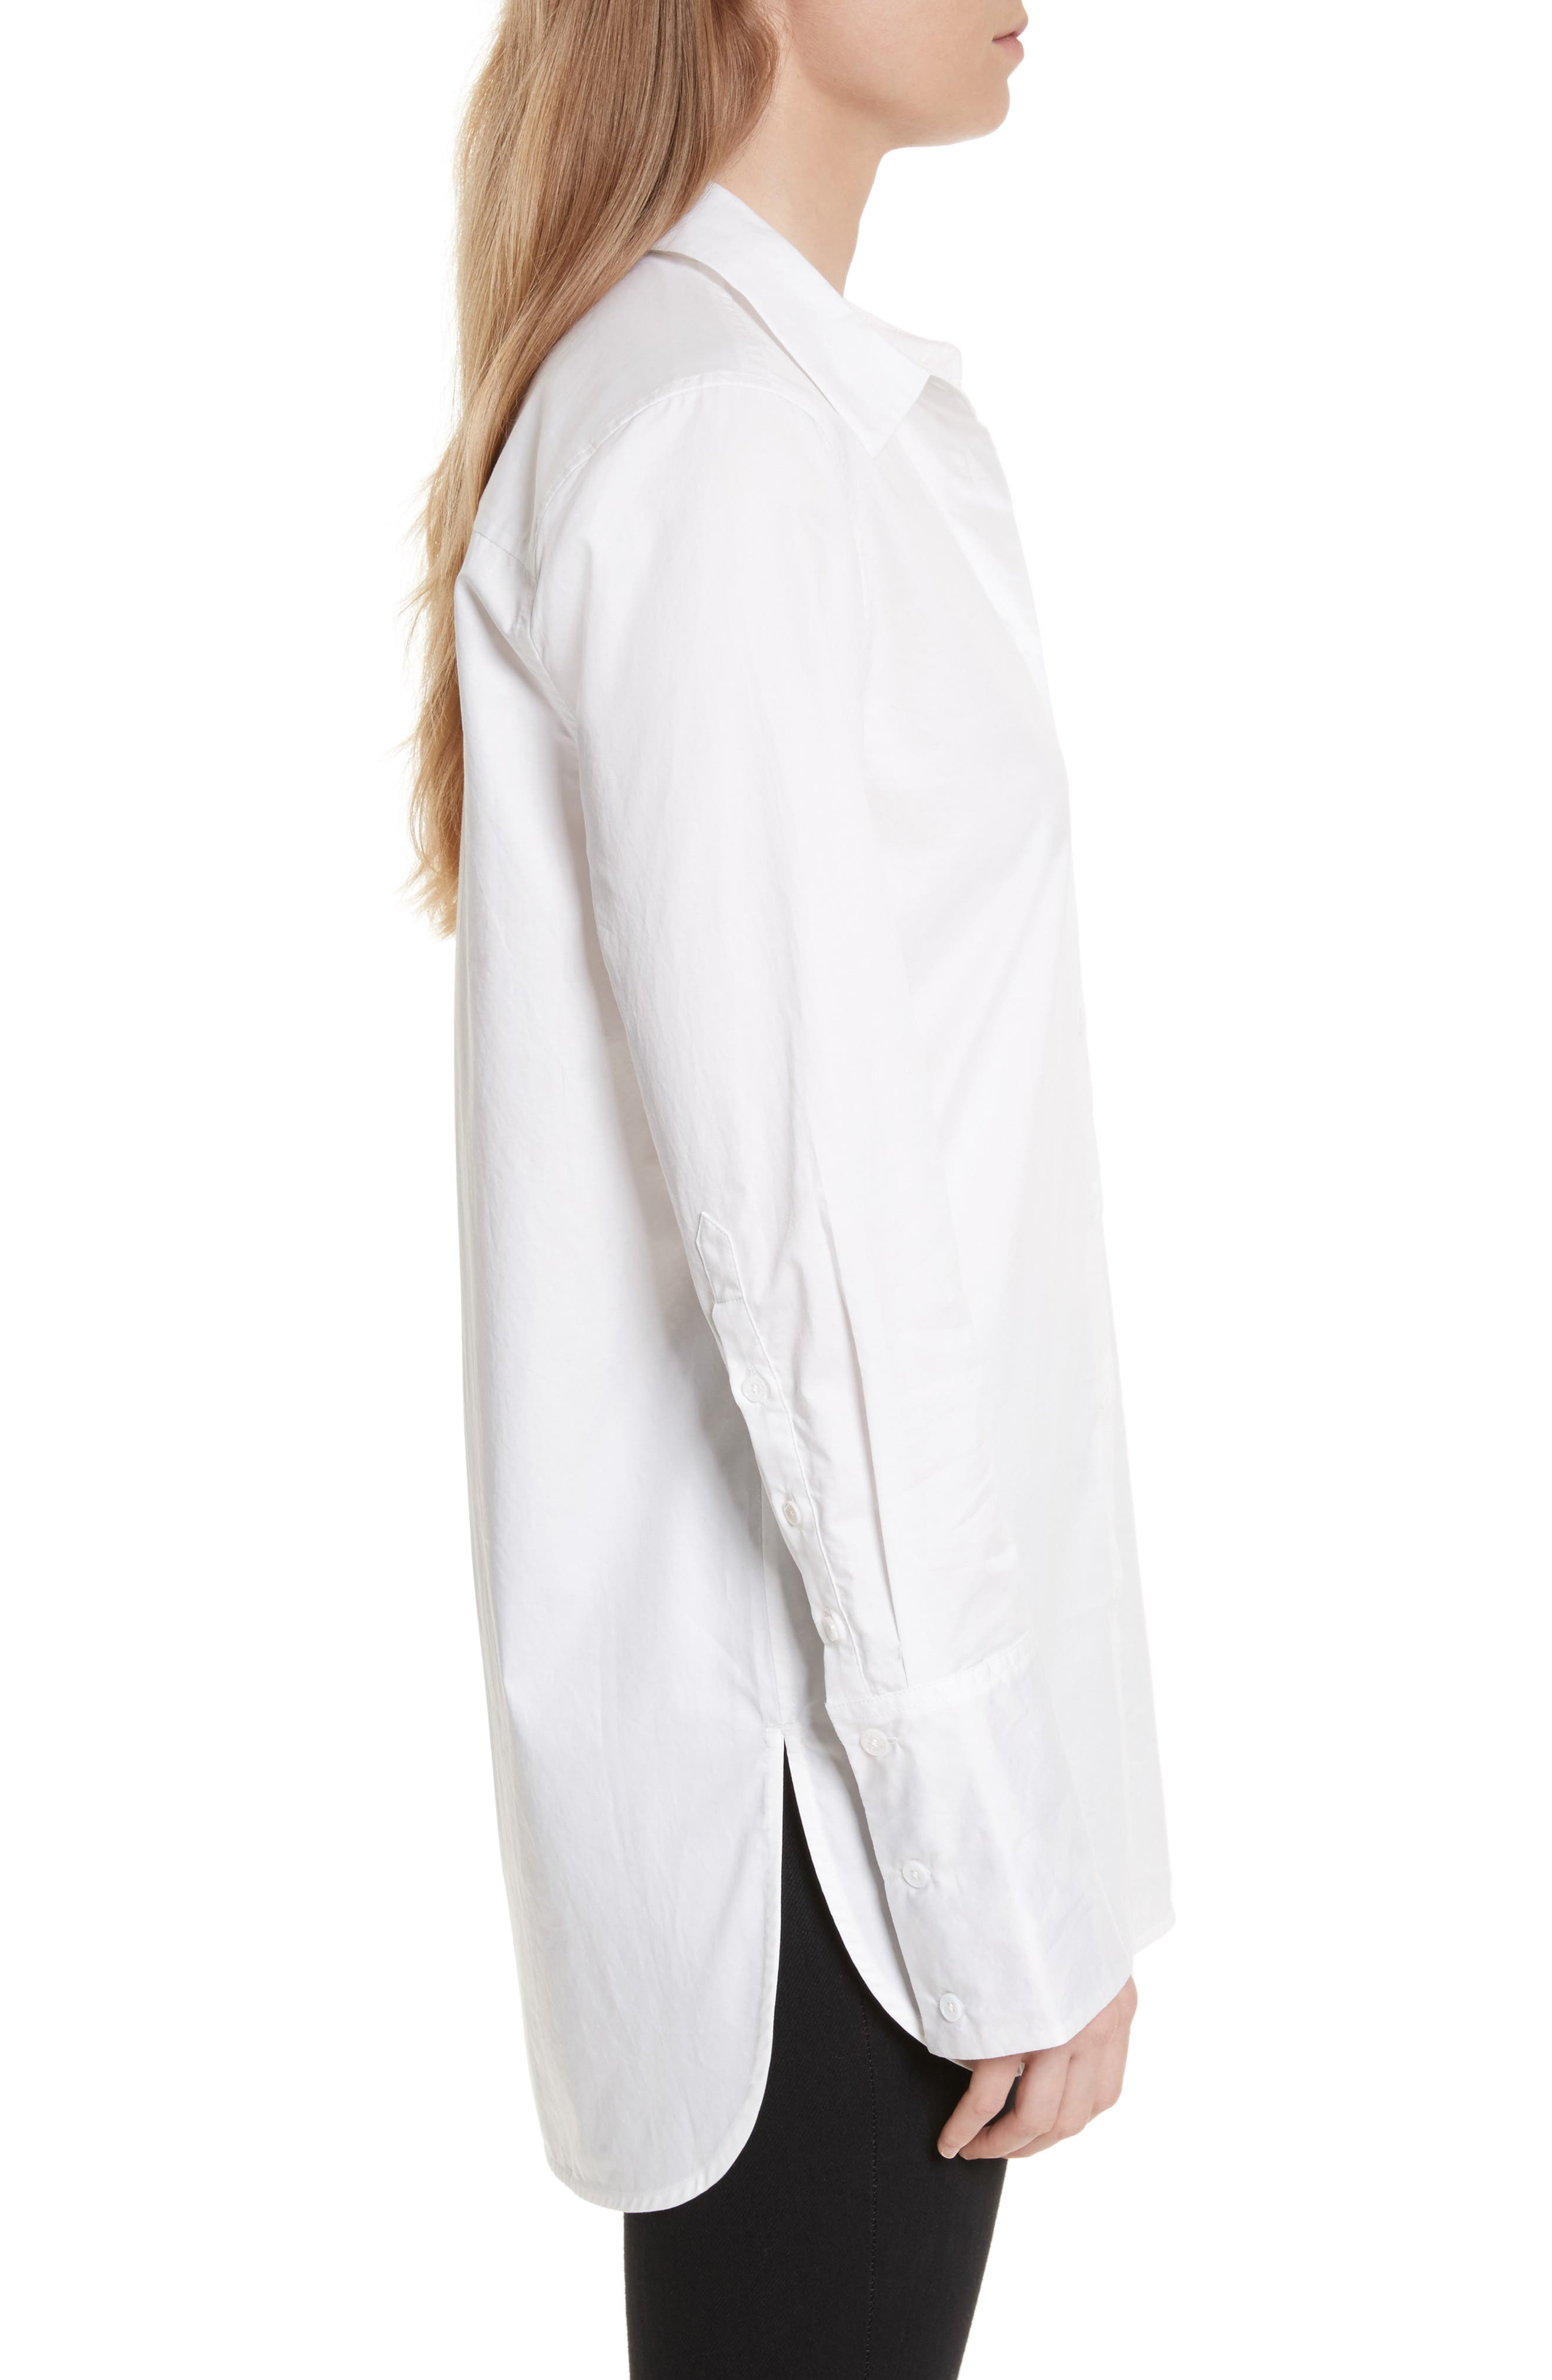 Arlette Cotton Shirt,                             Alternate thumbnail 3, color,                             Bright White